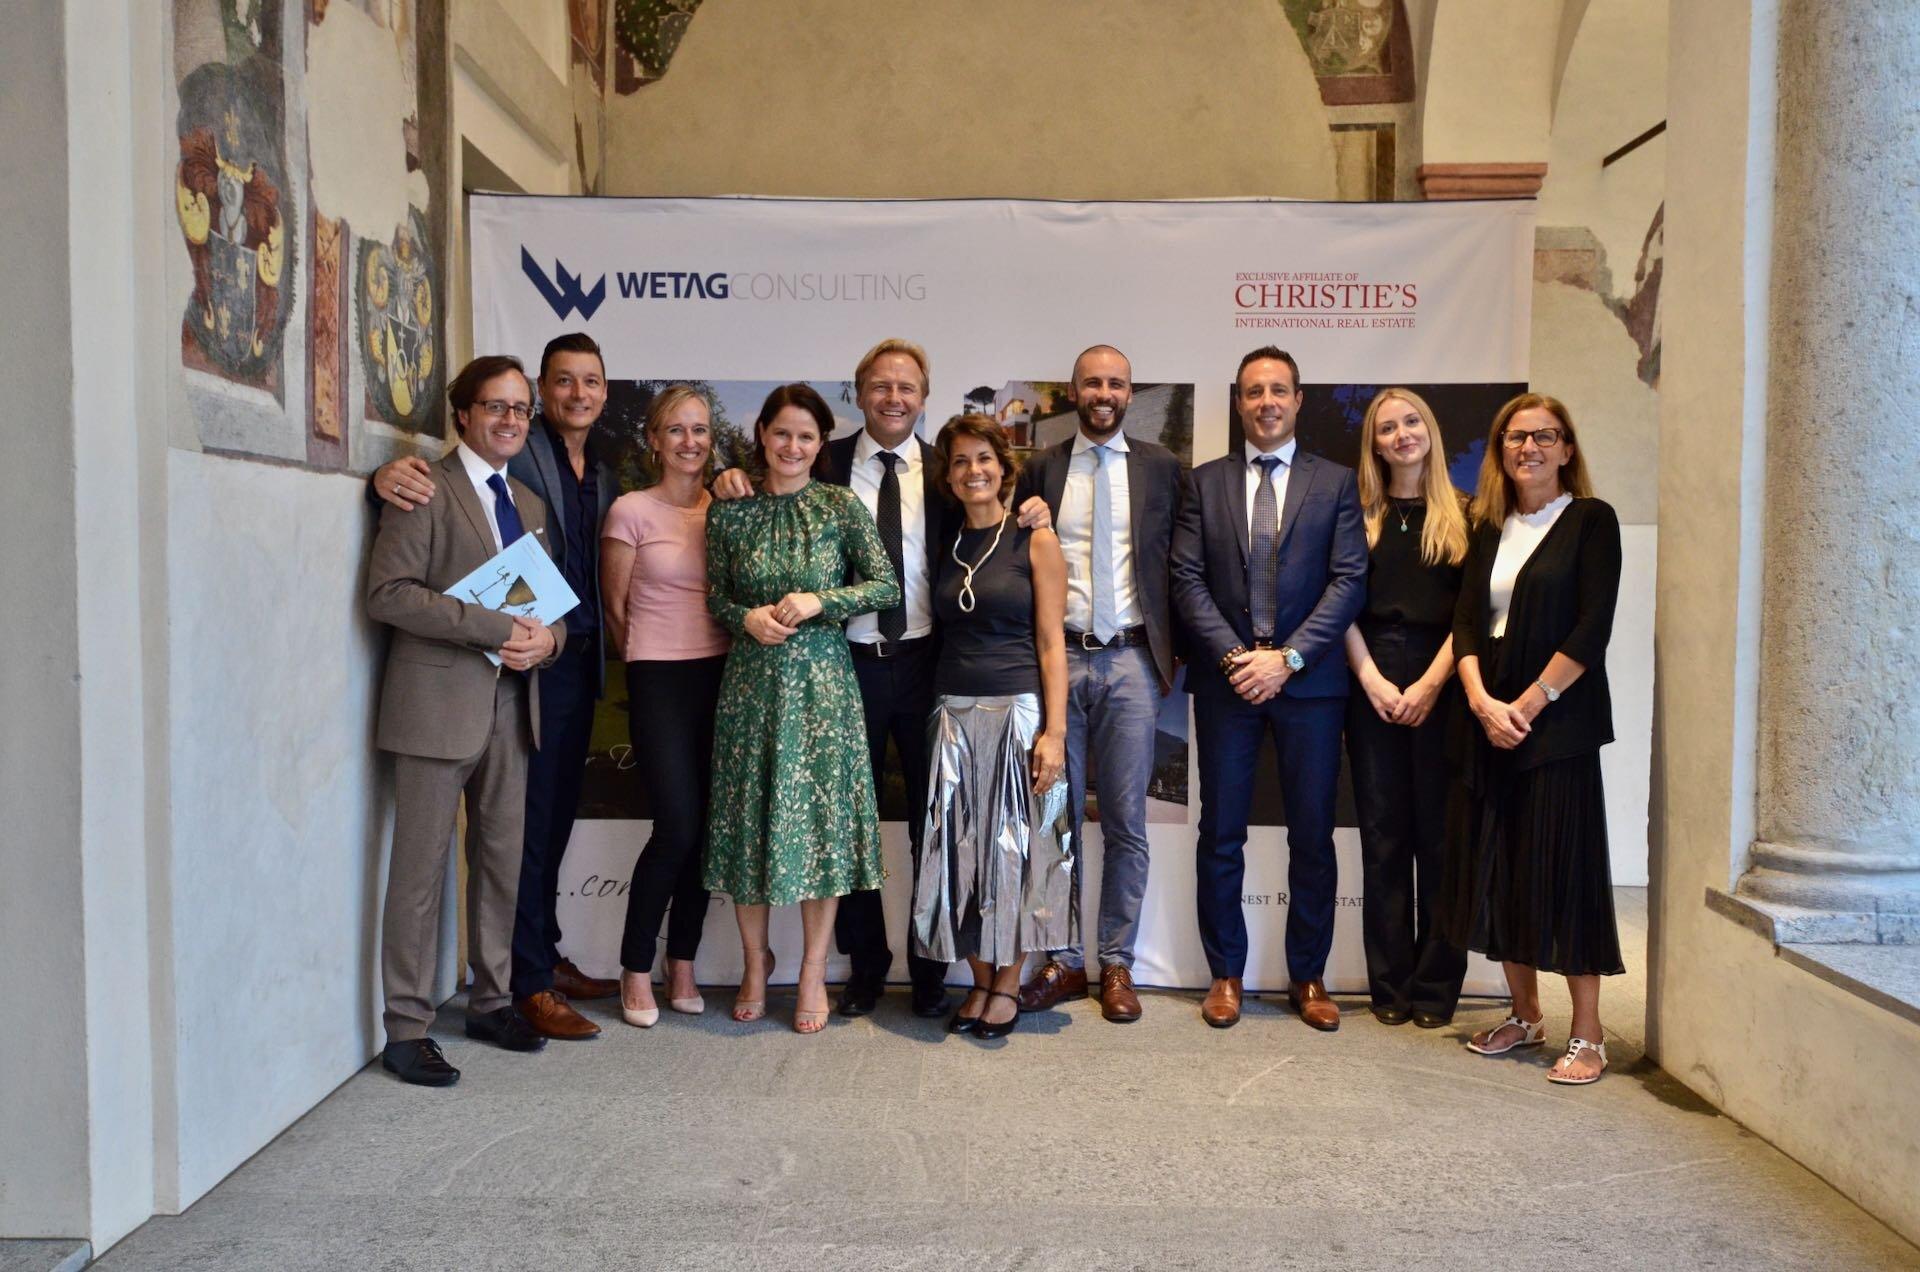 Christie's Event LAC Lugano 9-2019 - 22.jpg